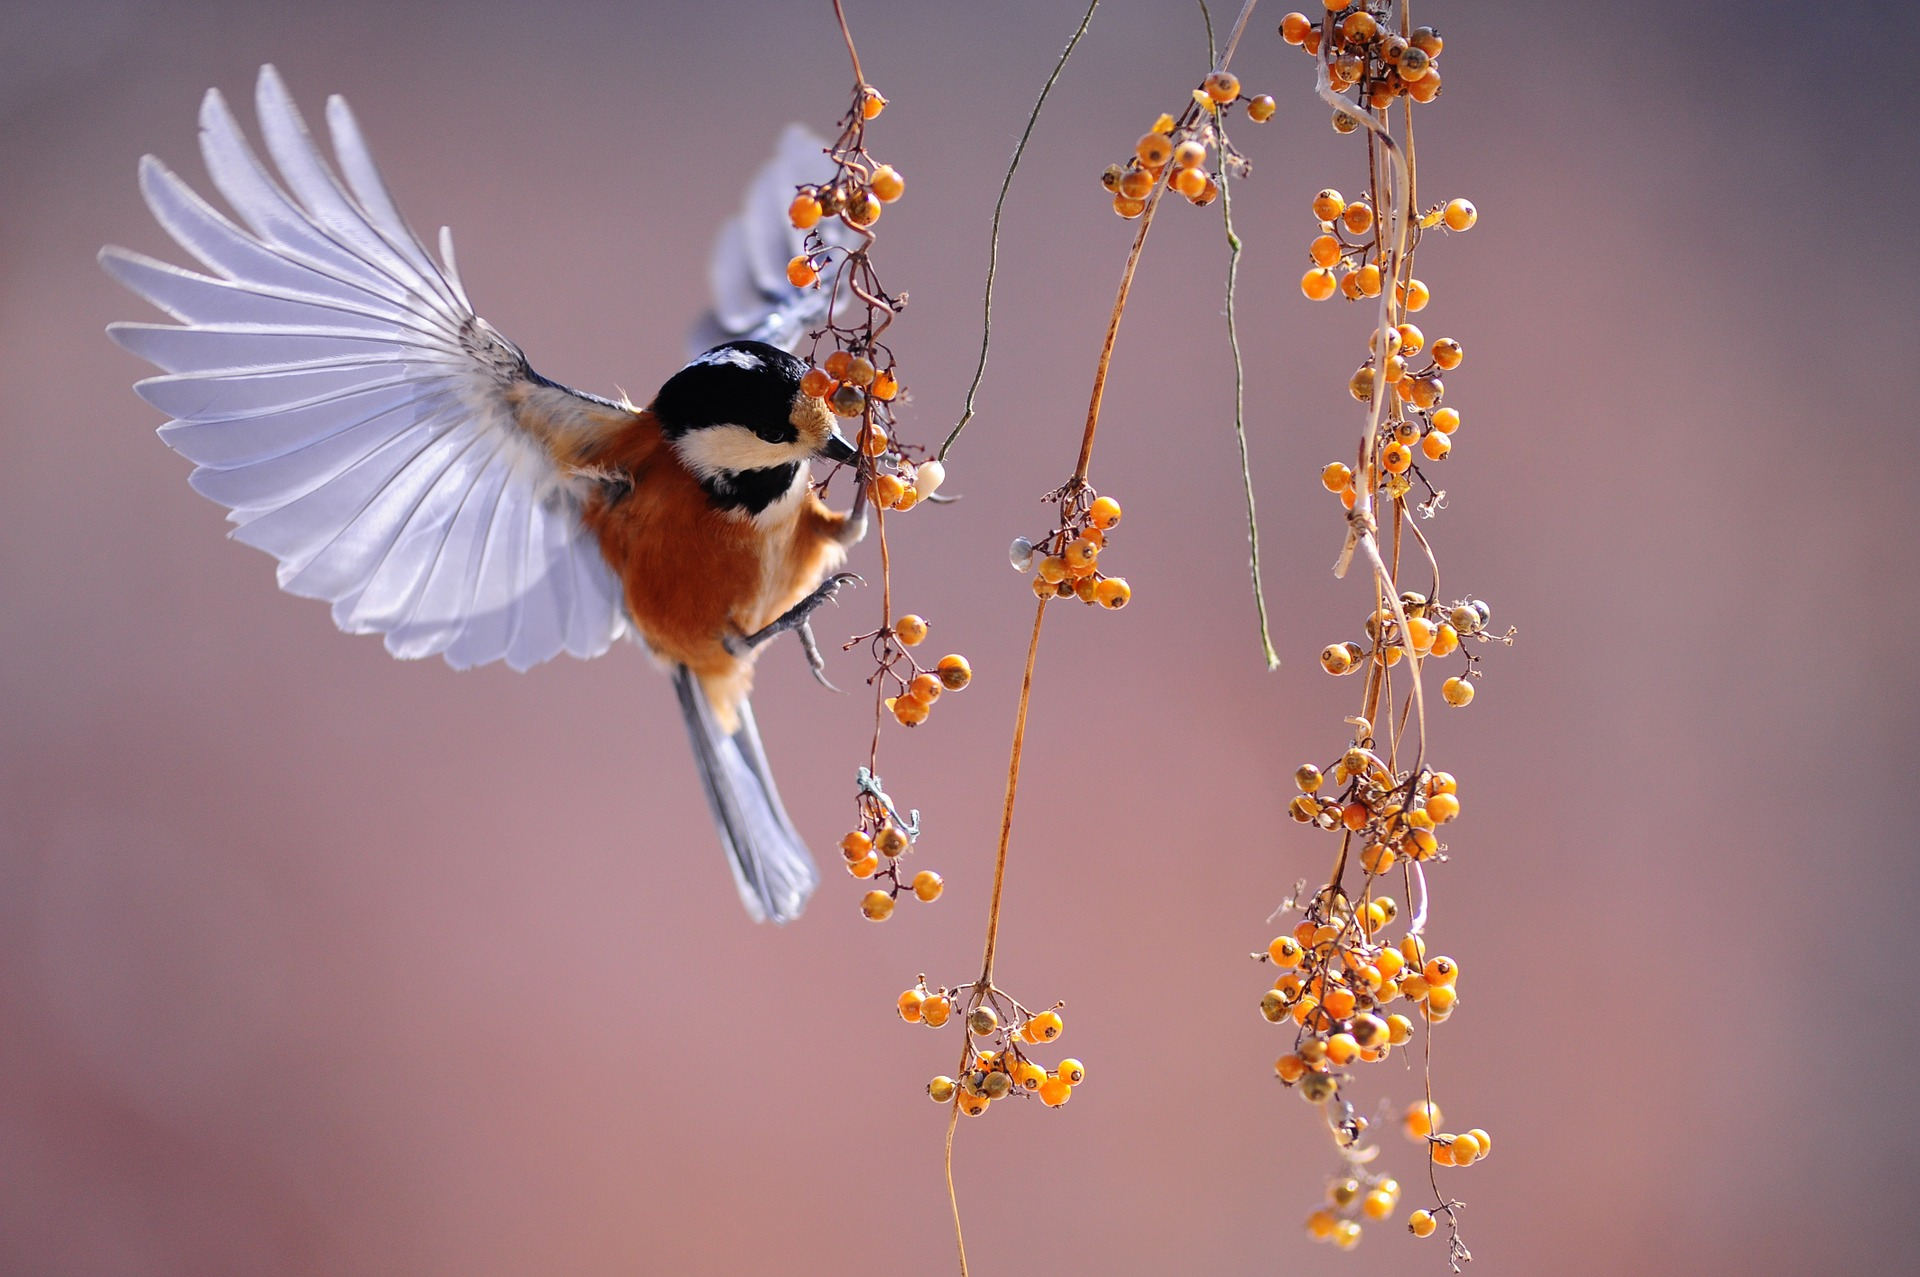 bird-1045954_1920.jpg